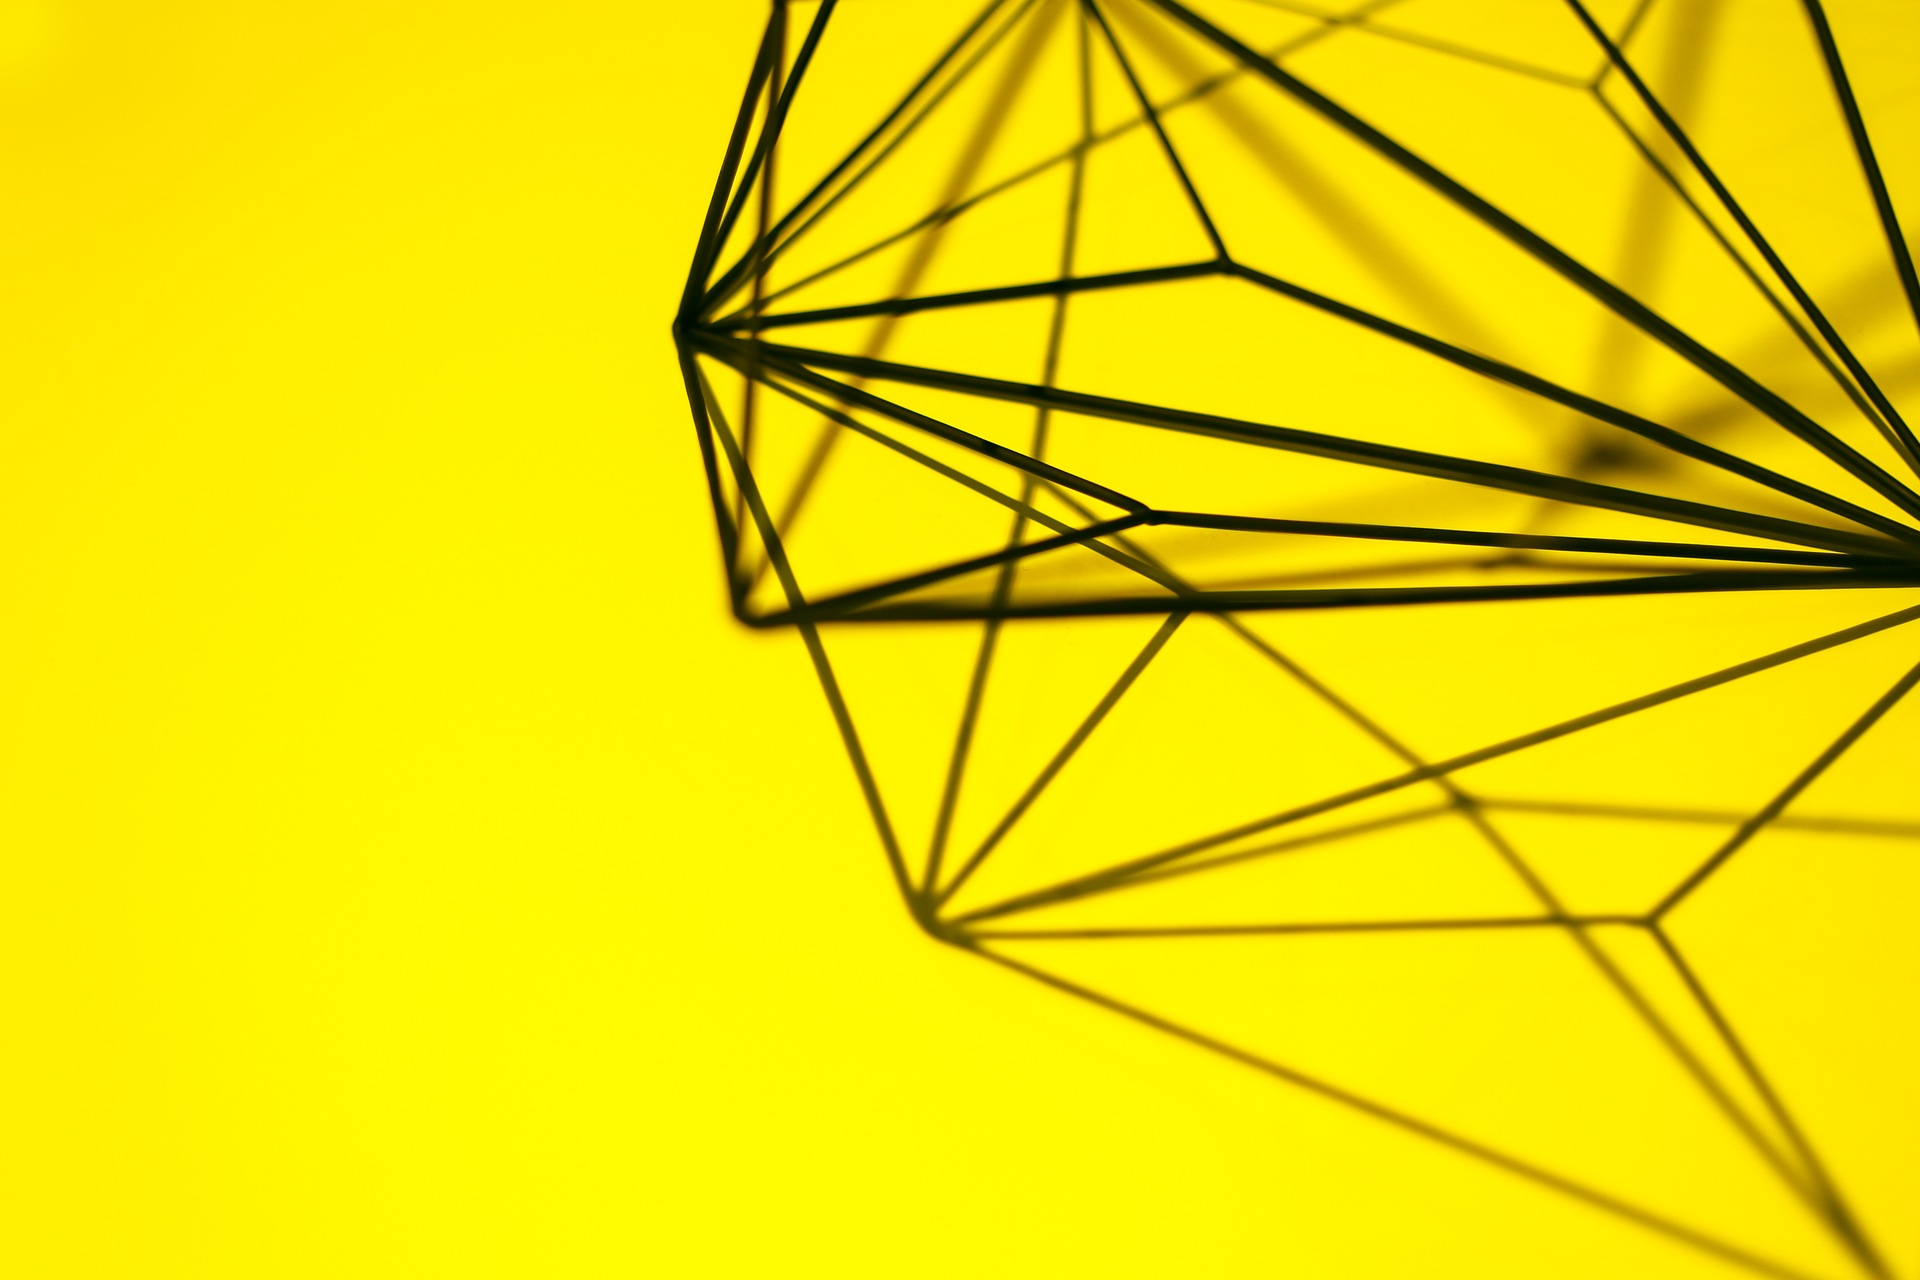 Geometrie, Gestaltung, Kreativität, Kunst, Gelb - Wallpaper HD - Prof.-falken.com